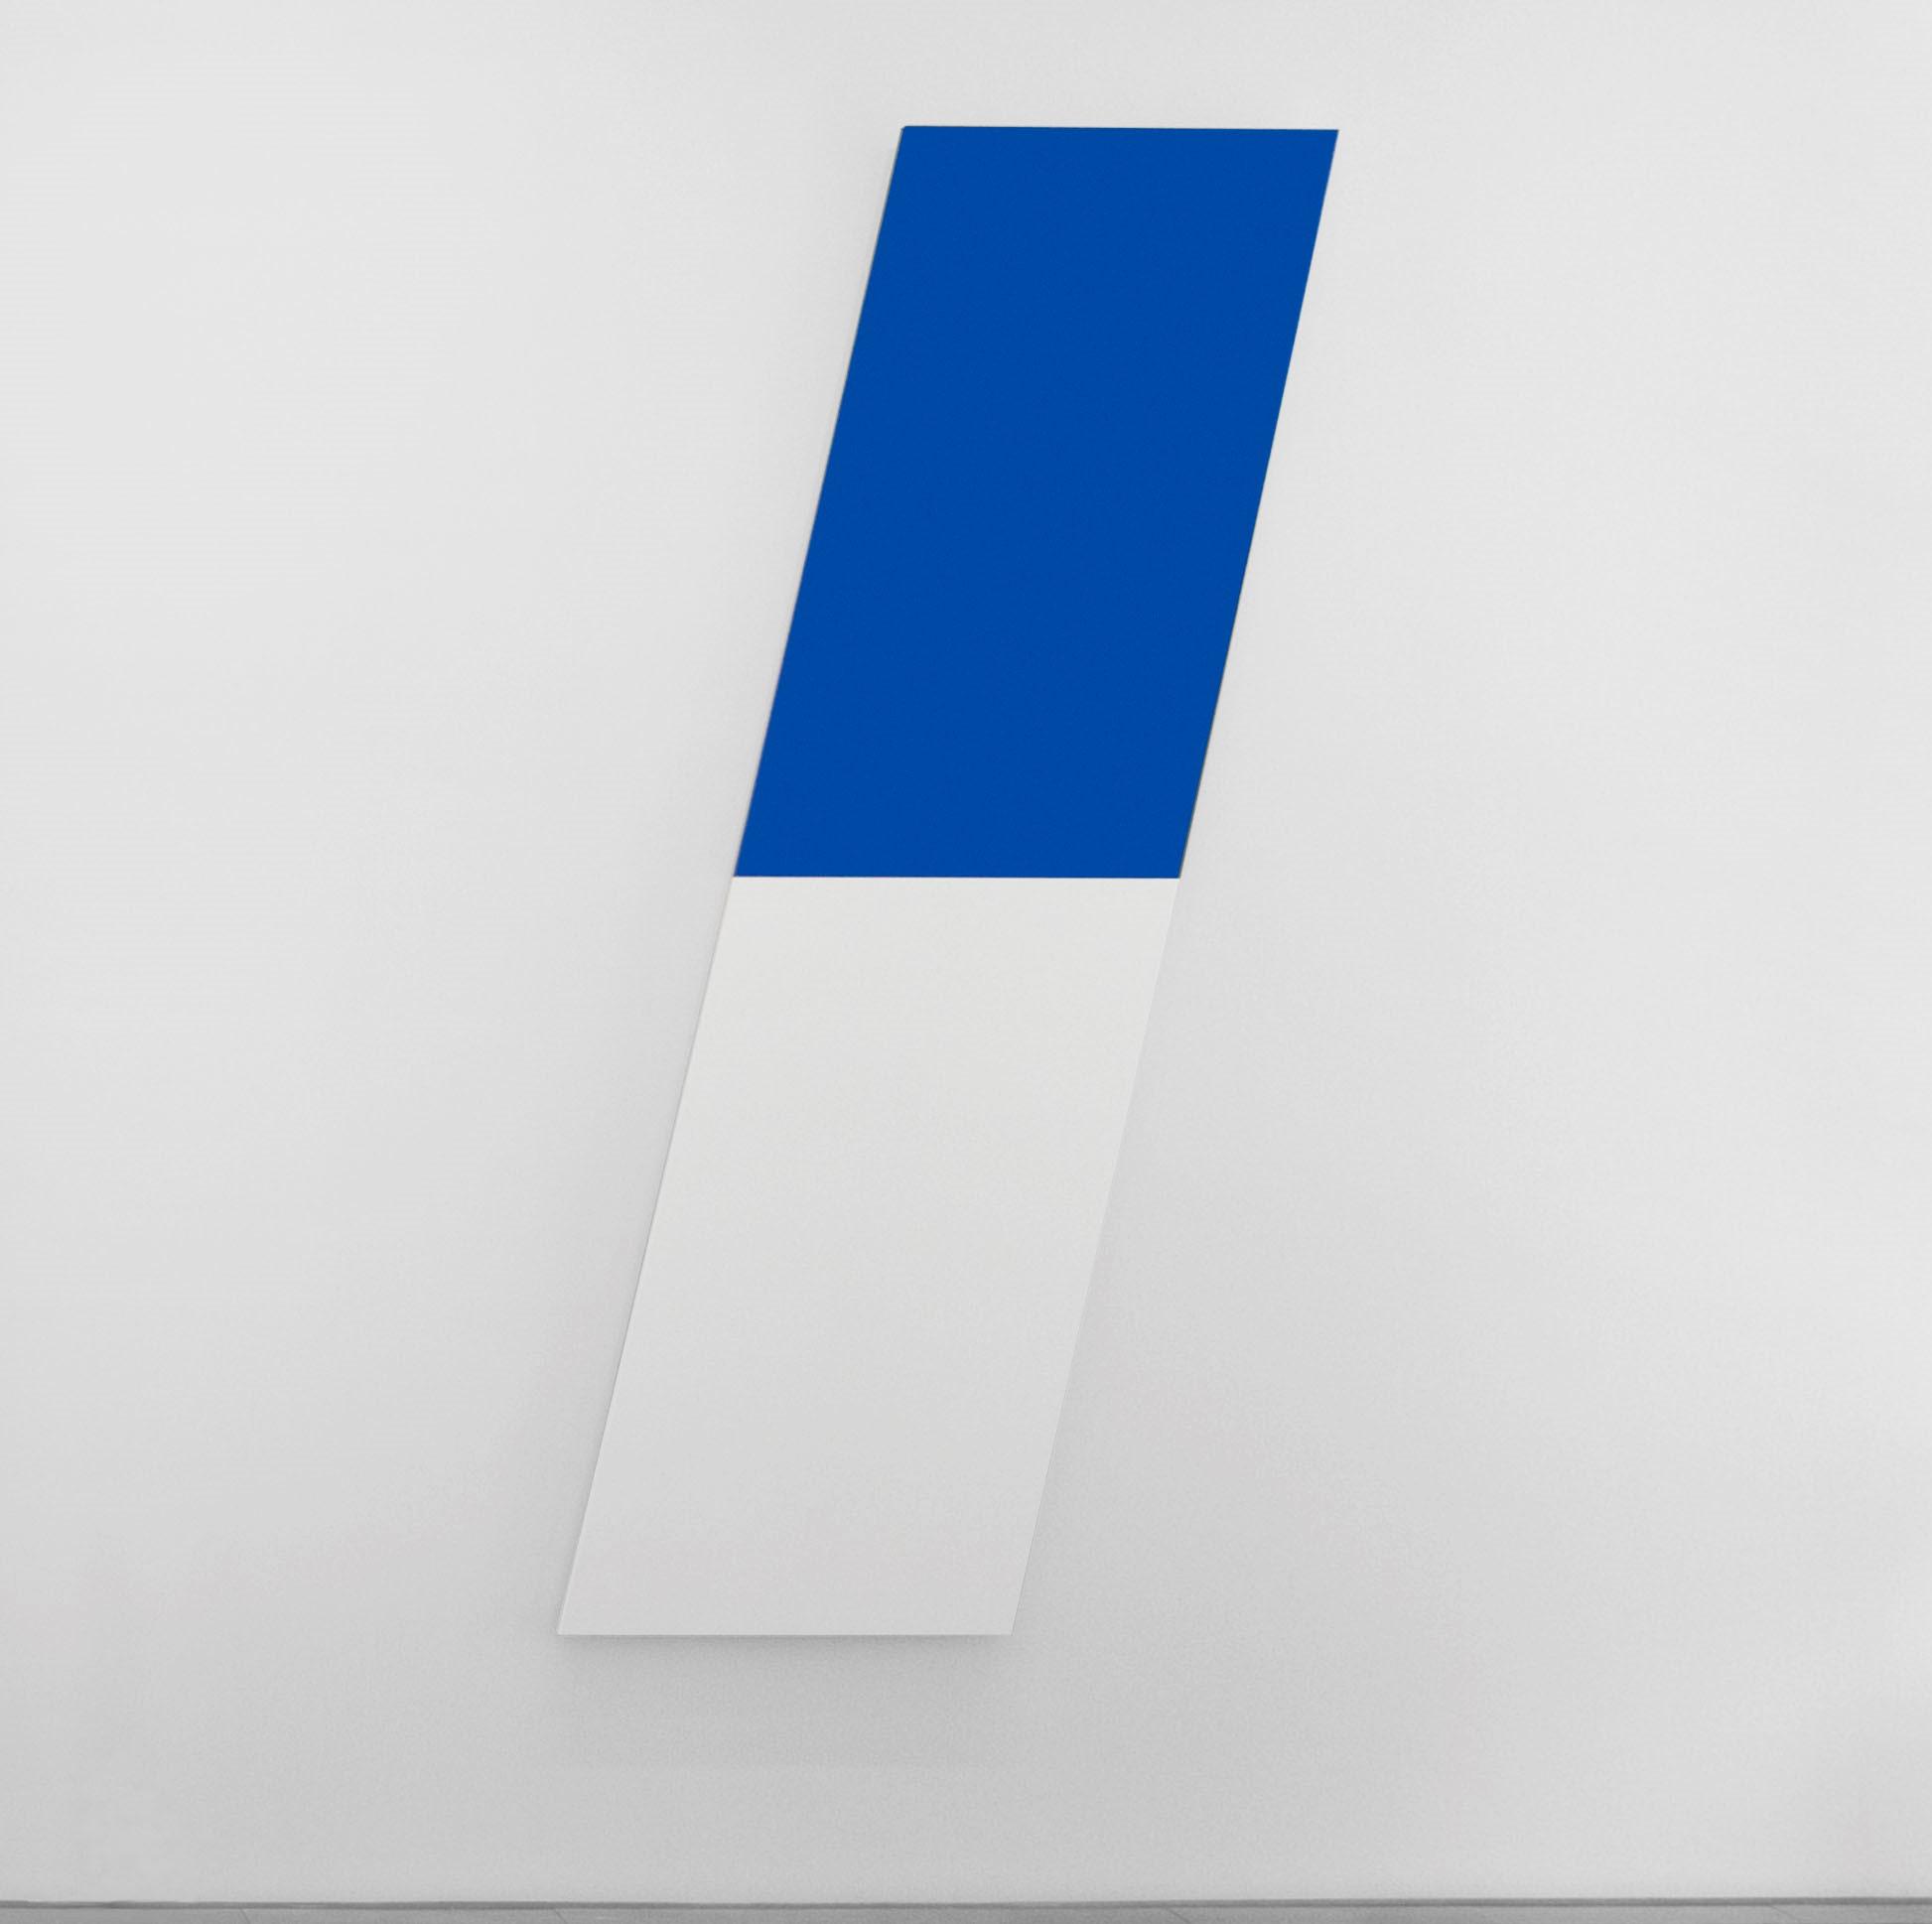 BLUE WHITE GRM